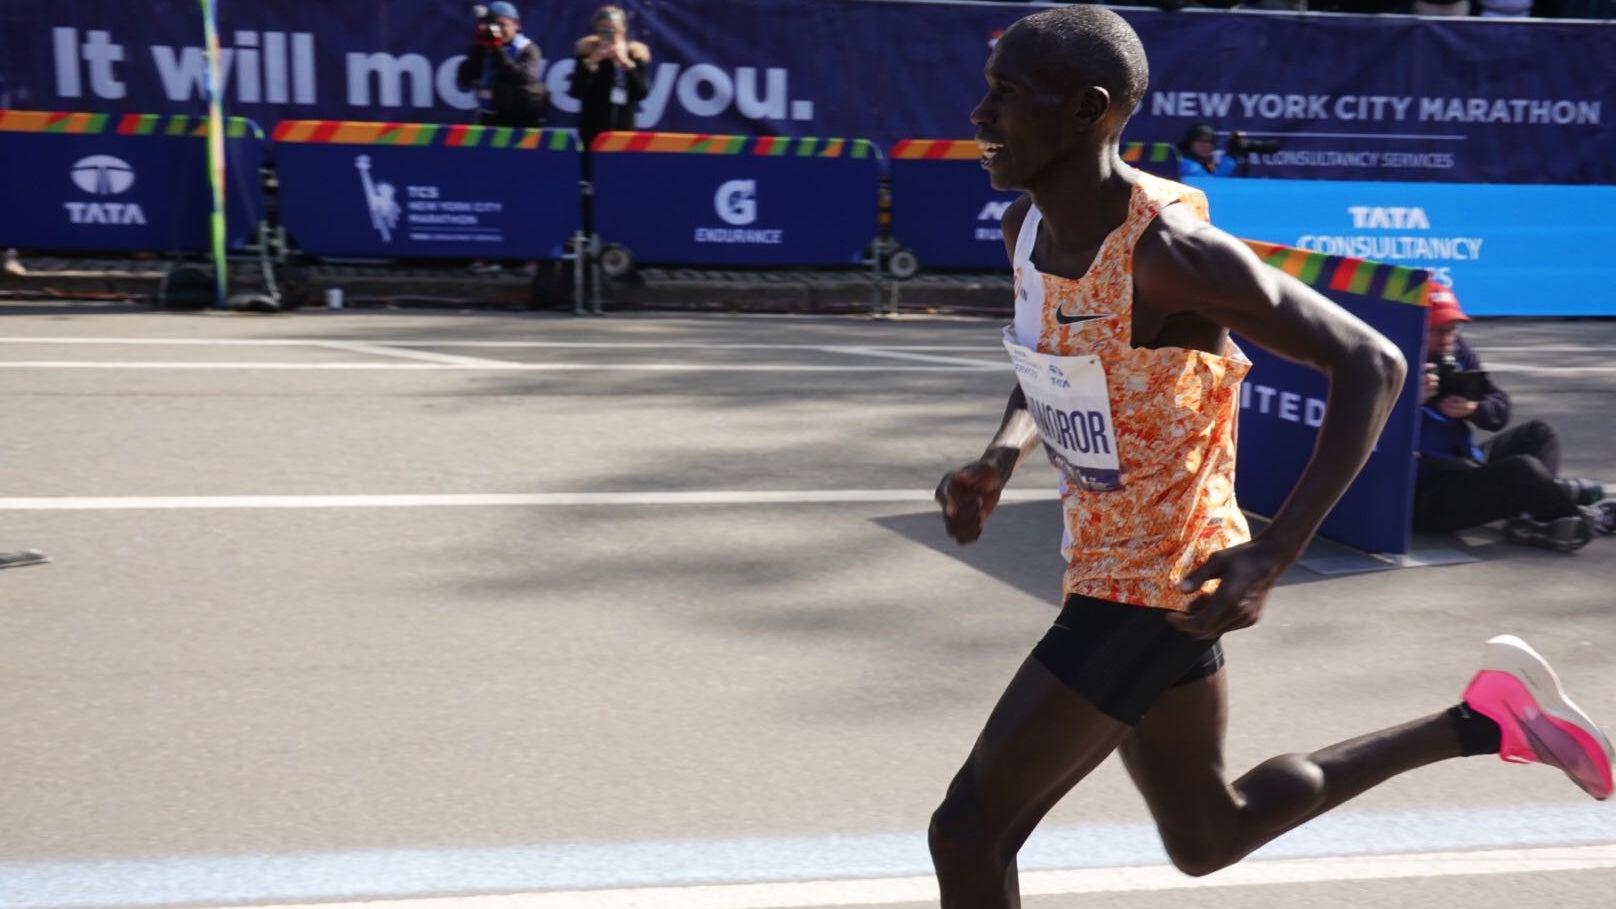 Kamworor Wins 2019 New York City Marathon